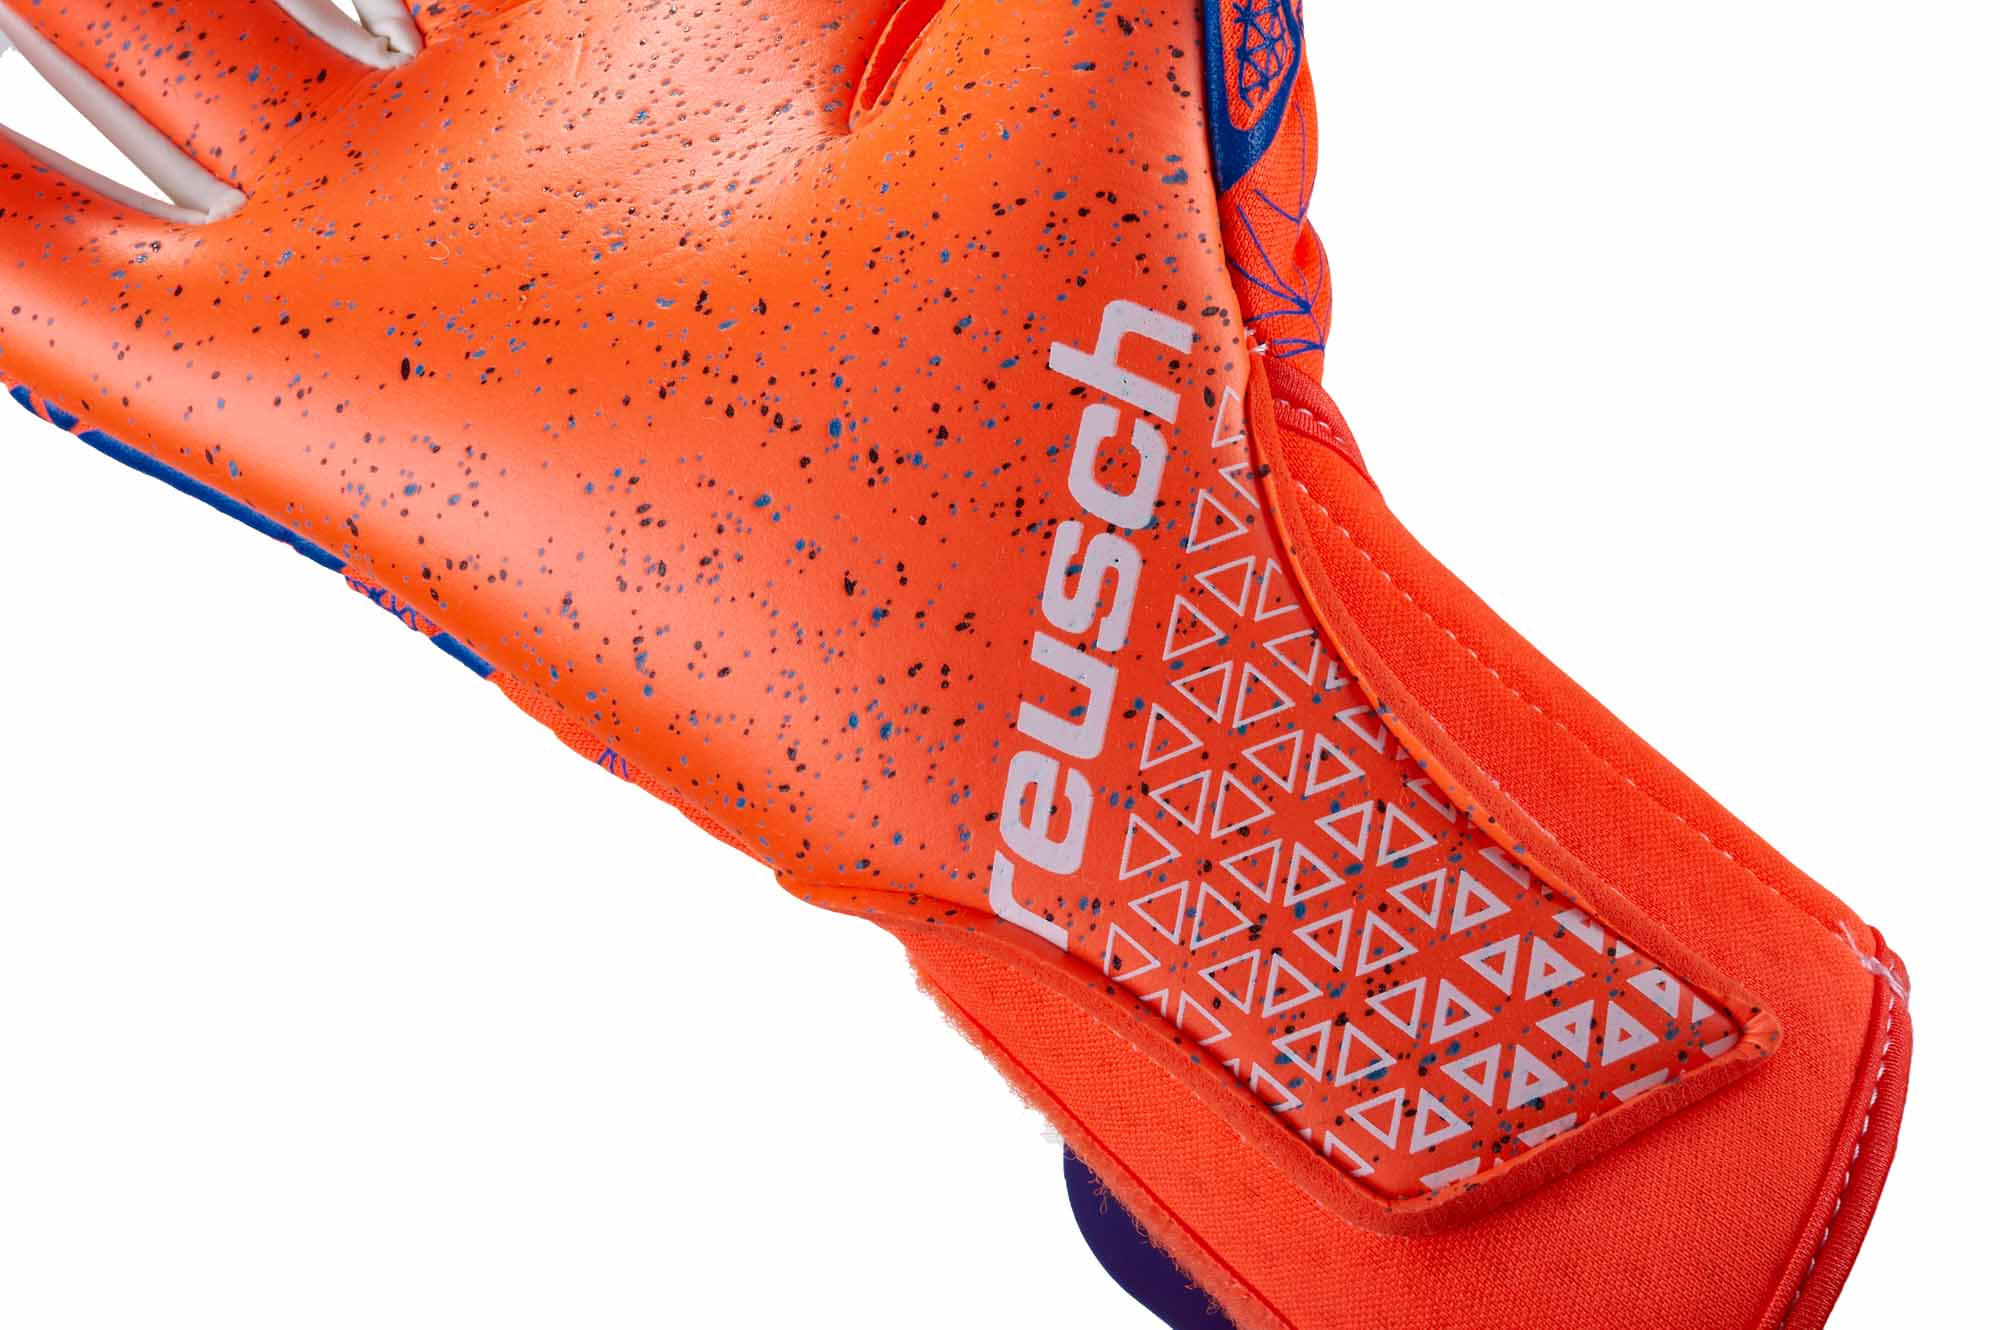 reusch pure contact g3 fusion goalkeeper gloves shocking orange blue soccerpro. Black Bedroom Furniture Sets. Home Design Ideas